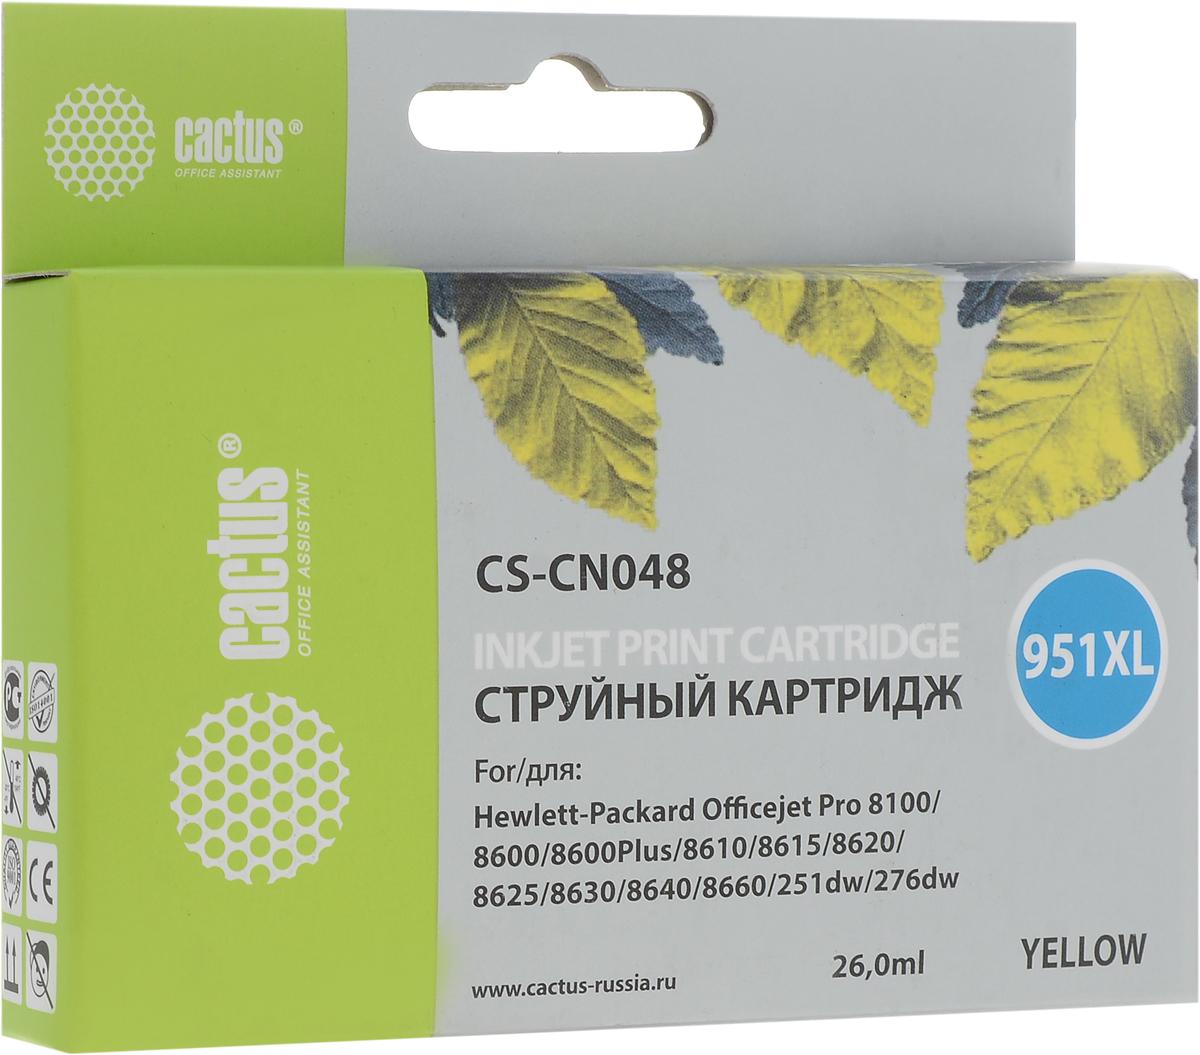 Cactus CS-CN048, Yellow струйный картридж для HP OfficeJet Pro 8100/ 8600 cactus cs cn048 yellow струйный картридж для hp officejet pro 8100 8600